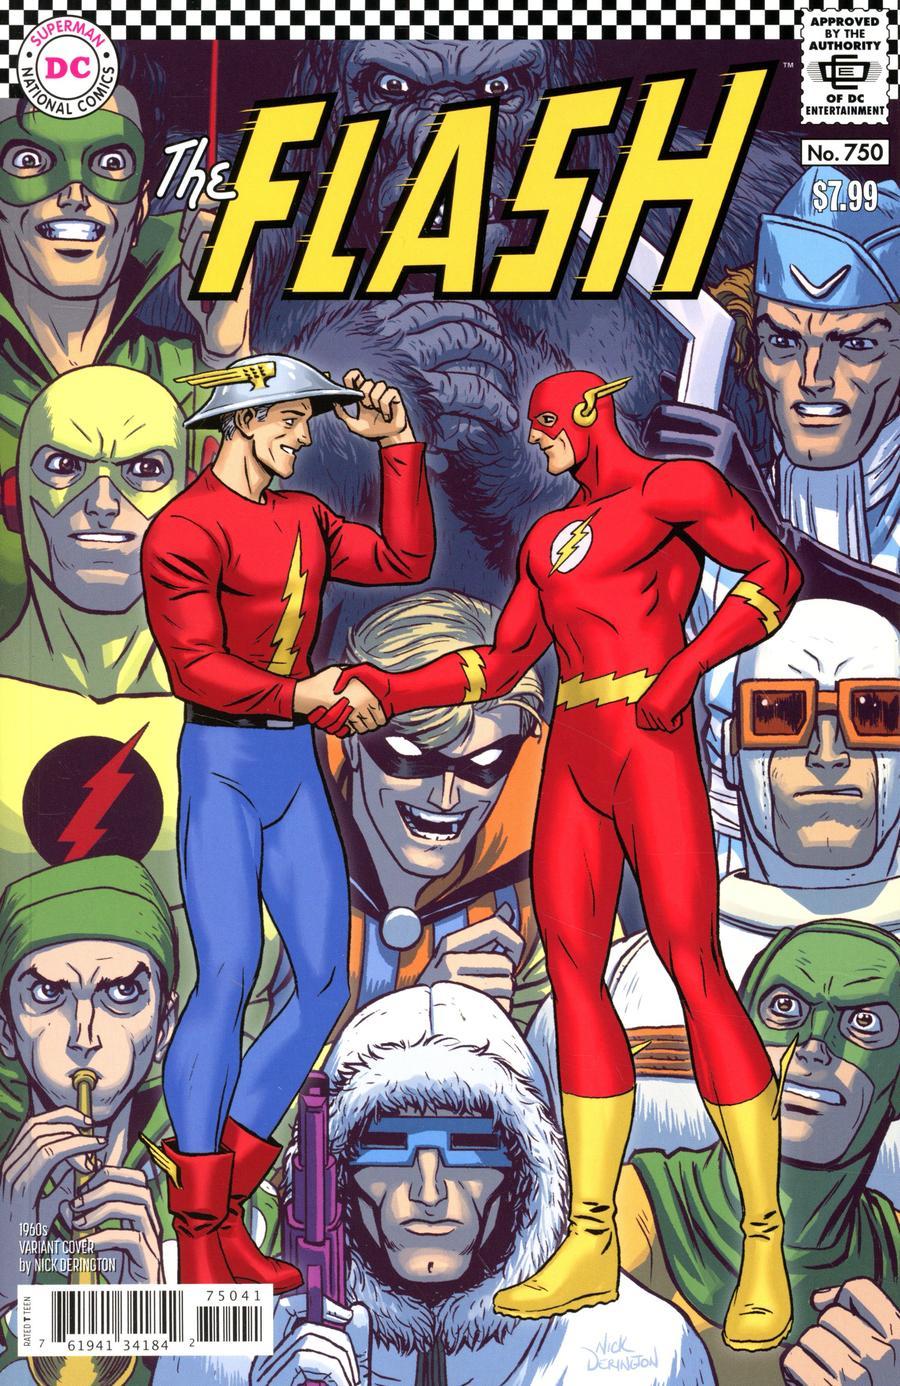 Flash Vol 5 #750 Cover D Variant Nick Derington 1960s Cover